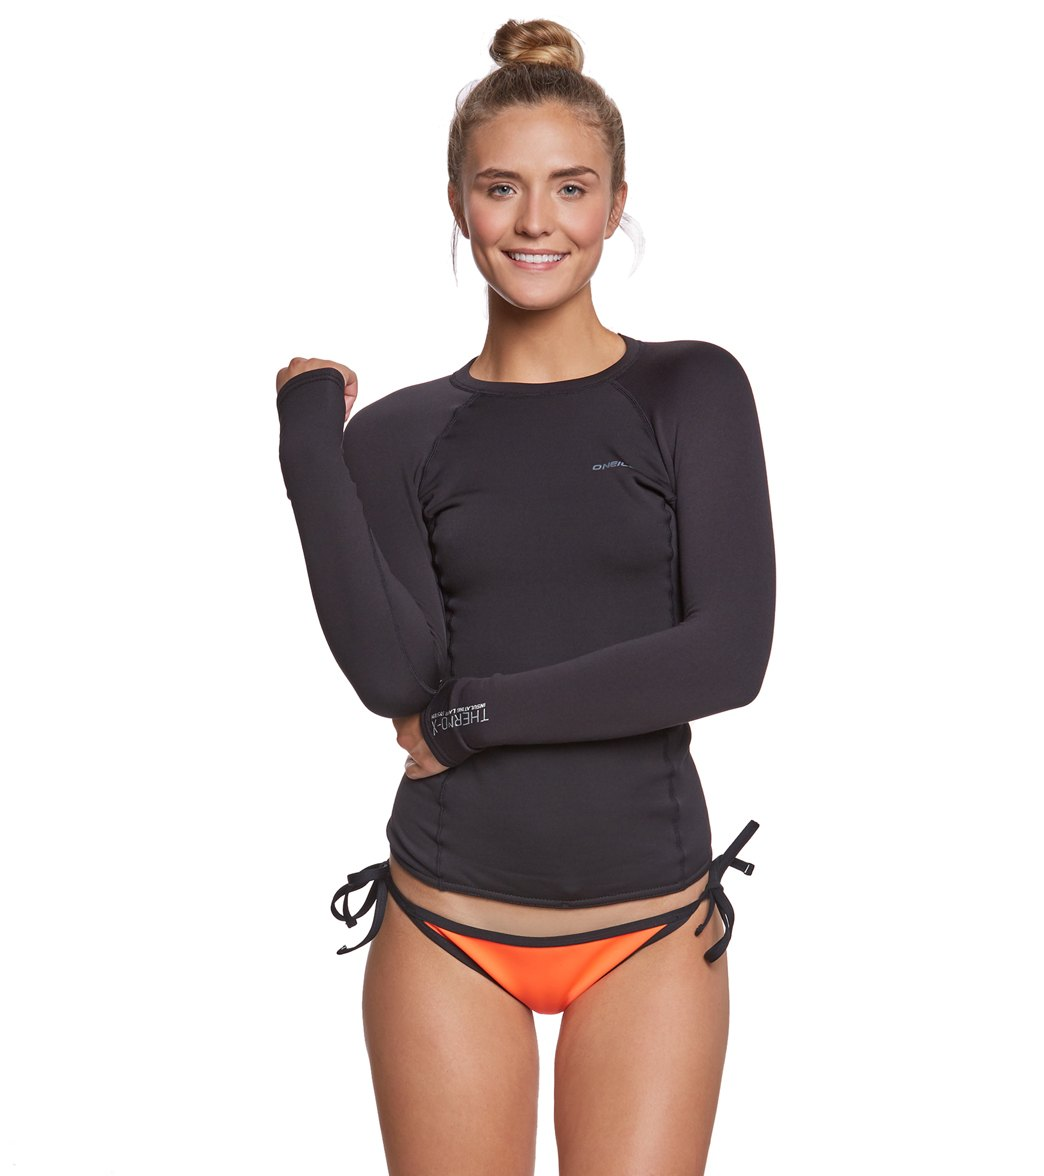 abdf3584143 Buy Women's Rash Guards & Swim Shirts Online at SwimOutlet.com